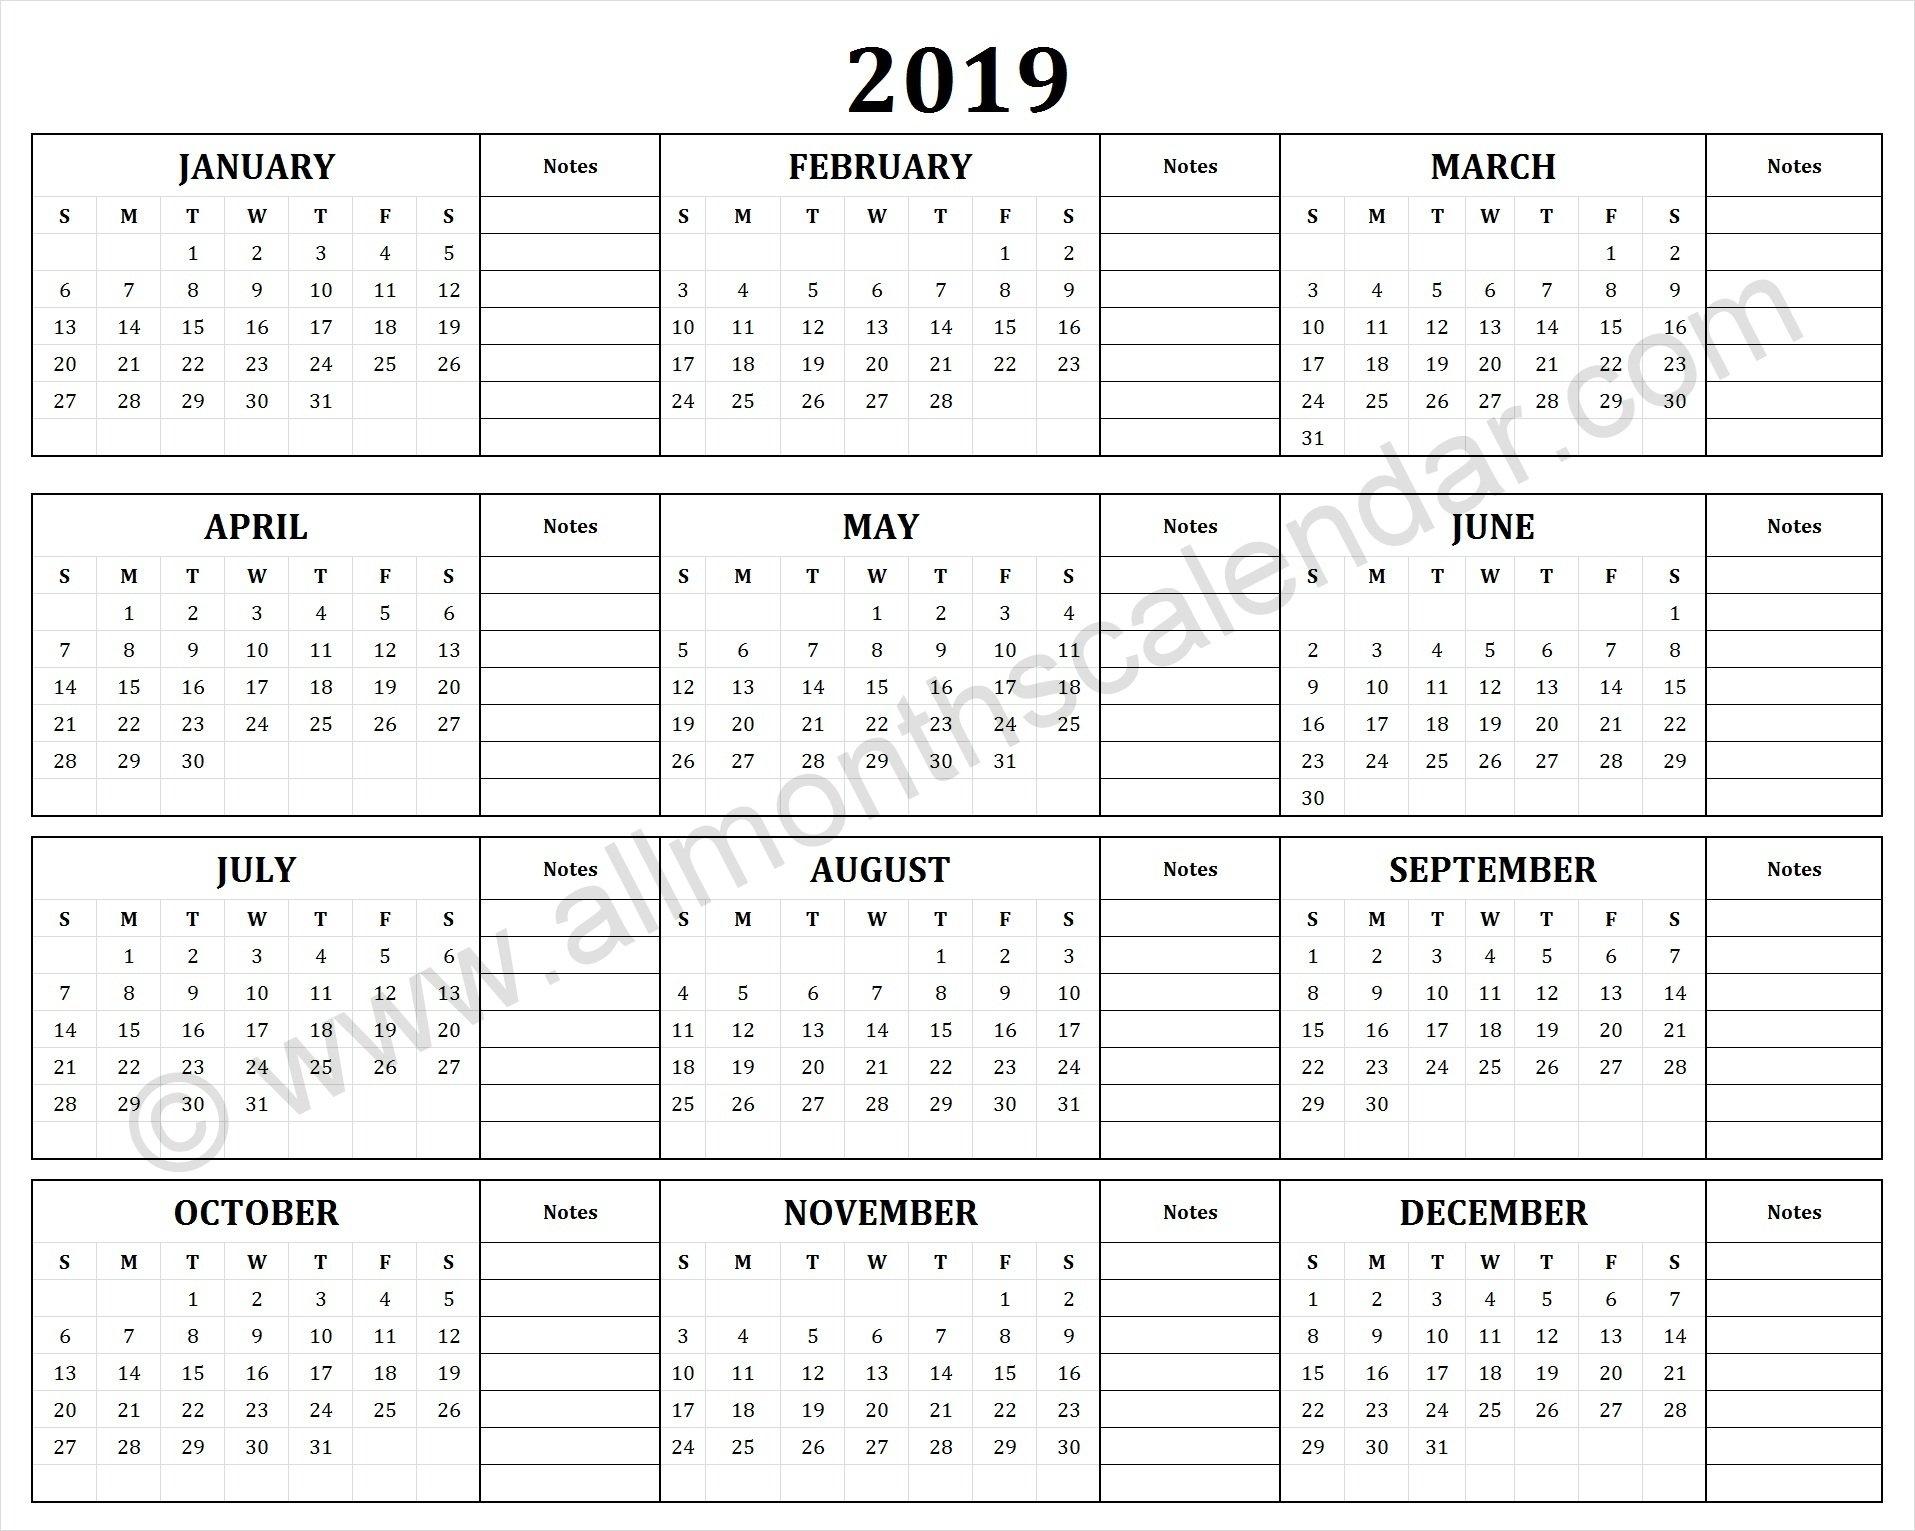 Yearly 2019 Yearly Calendar | 12 Month 2019 Calendar Printable Calendar 2019 Notes